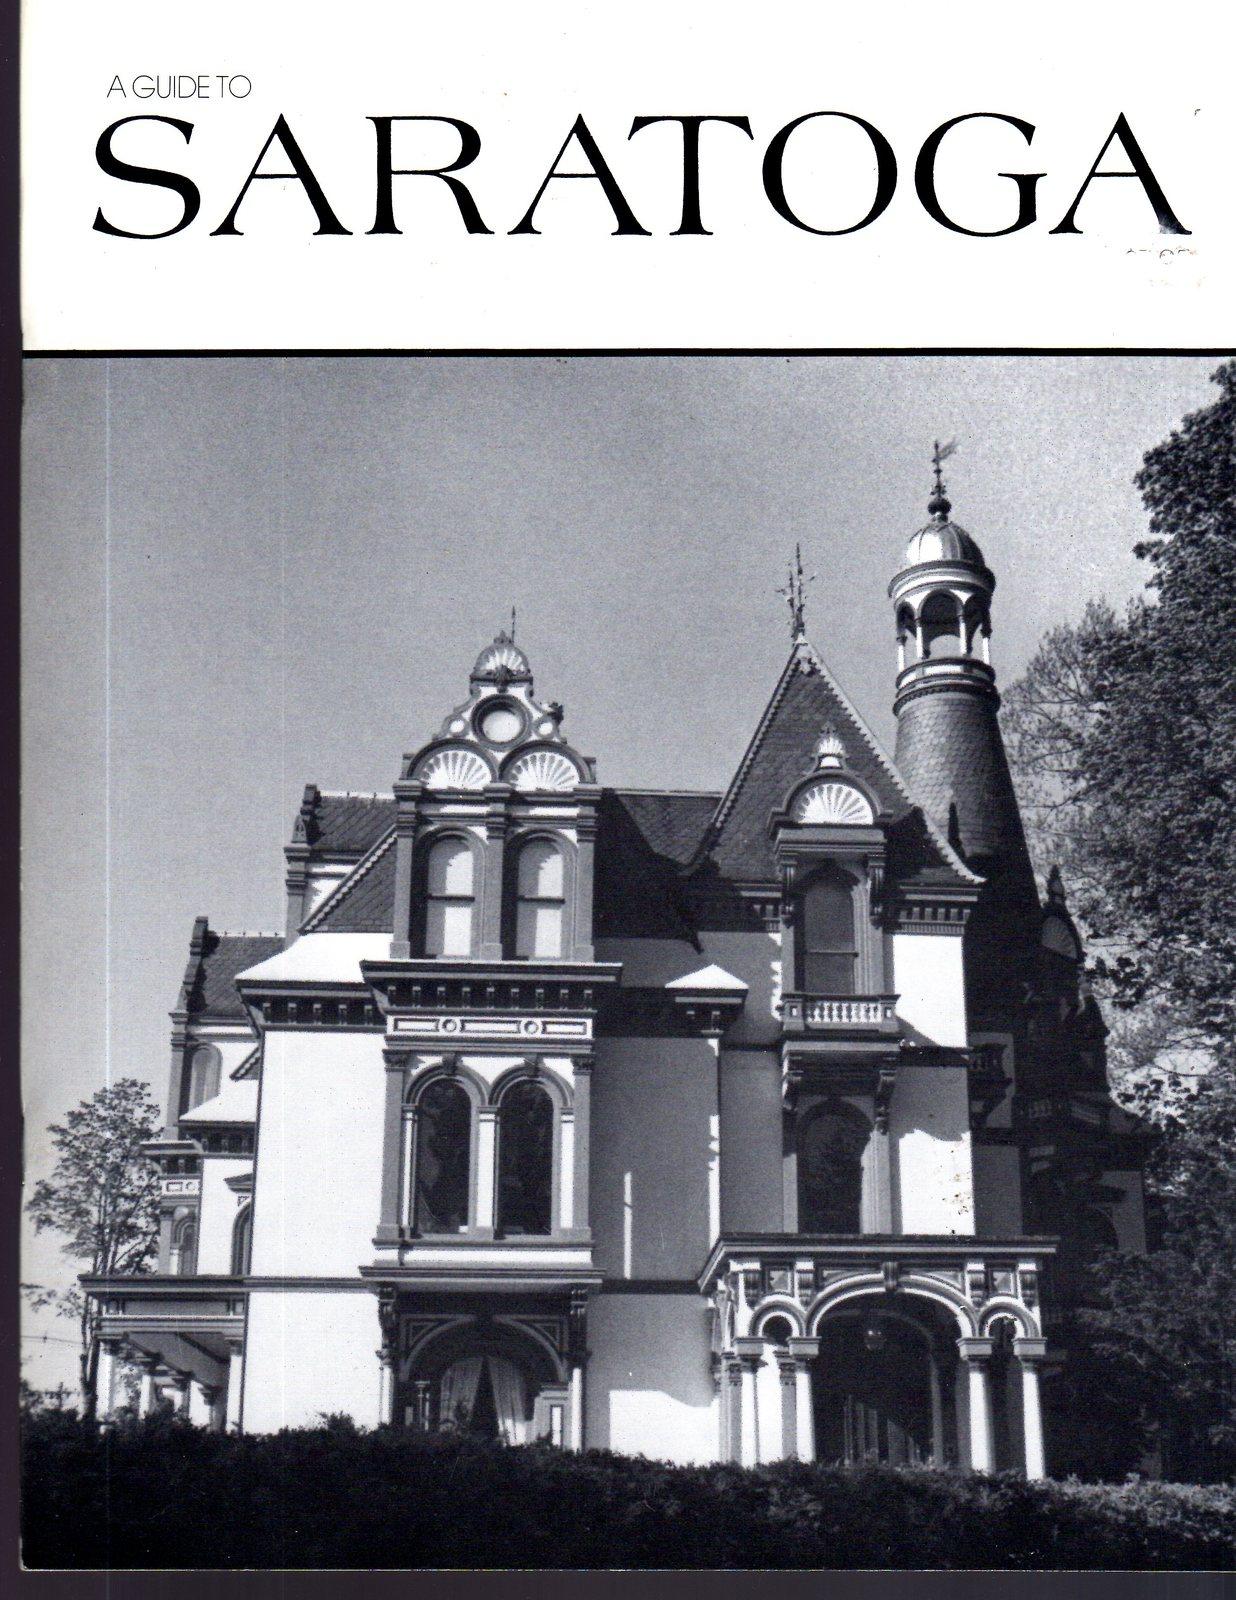 SARATOGA (A Guide to Saratoga, New York) Book image 2